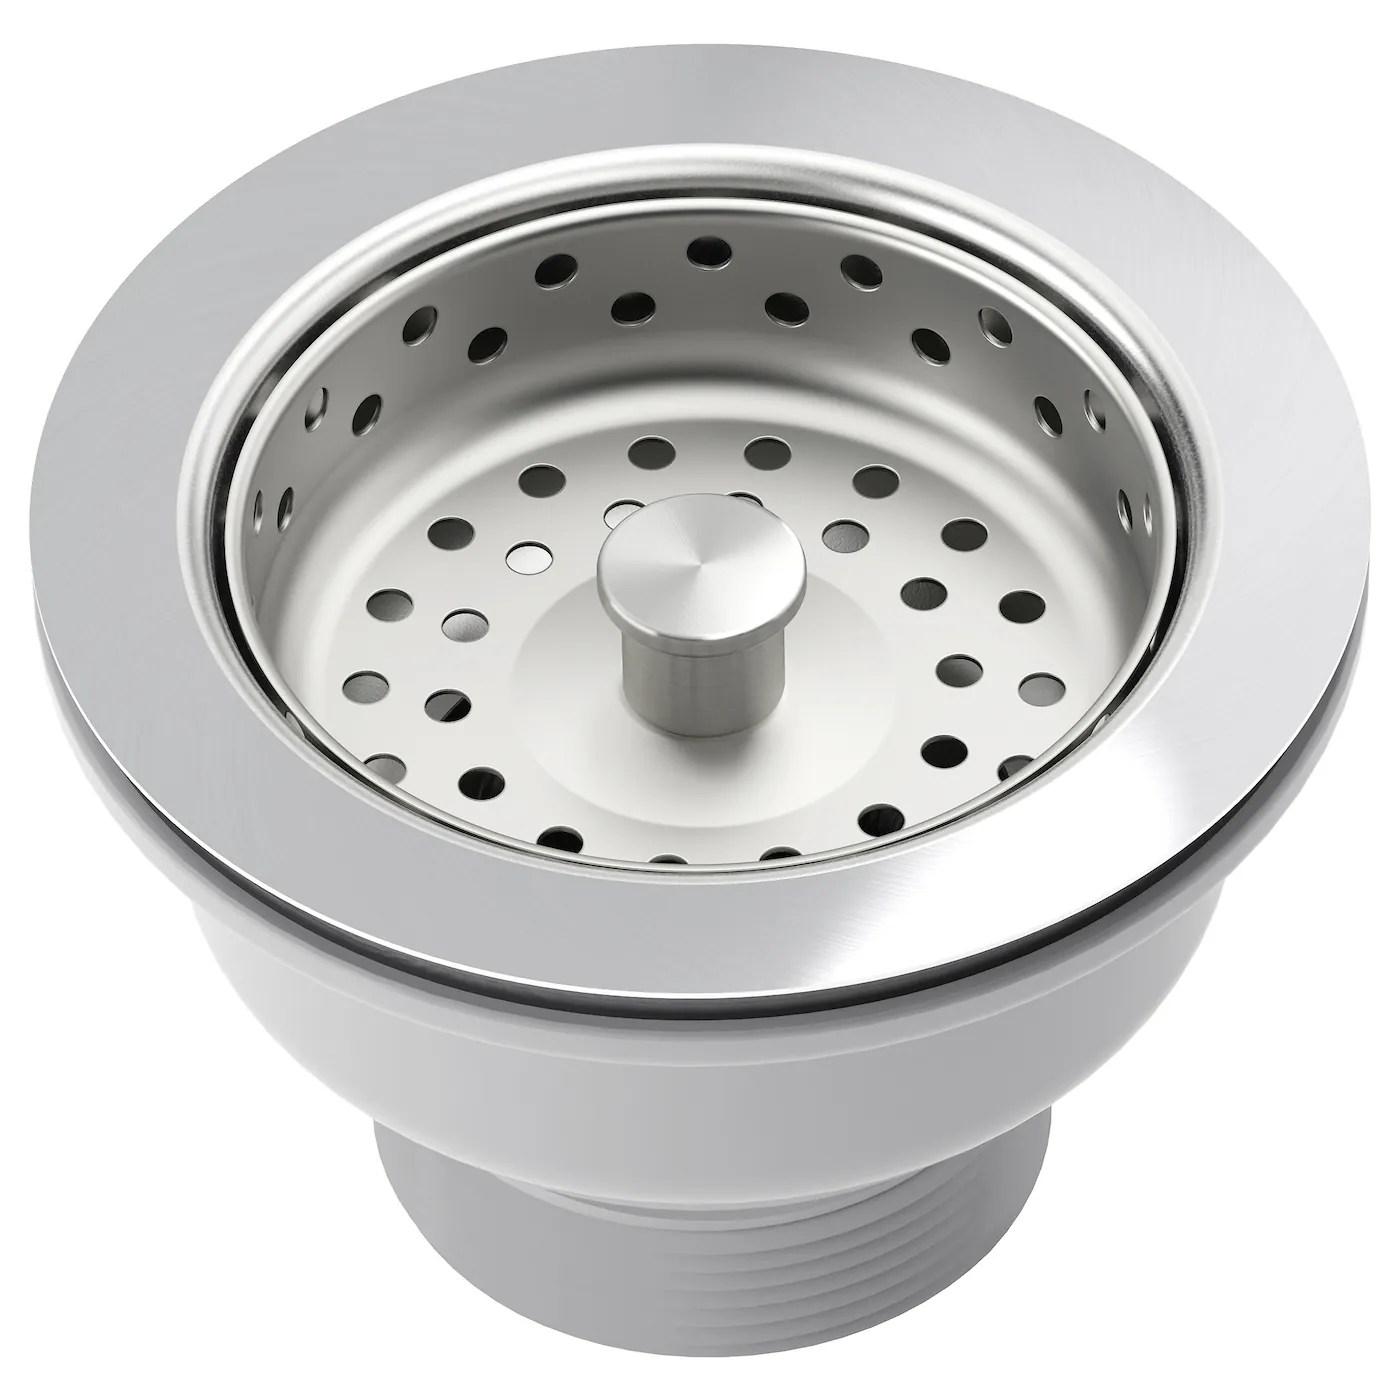 lillviken sink strainer with stopper